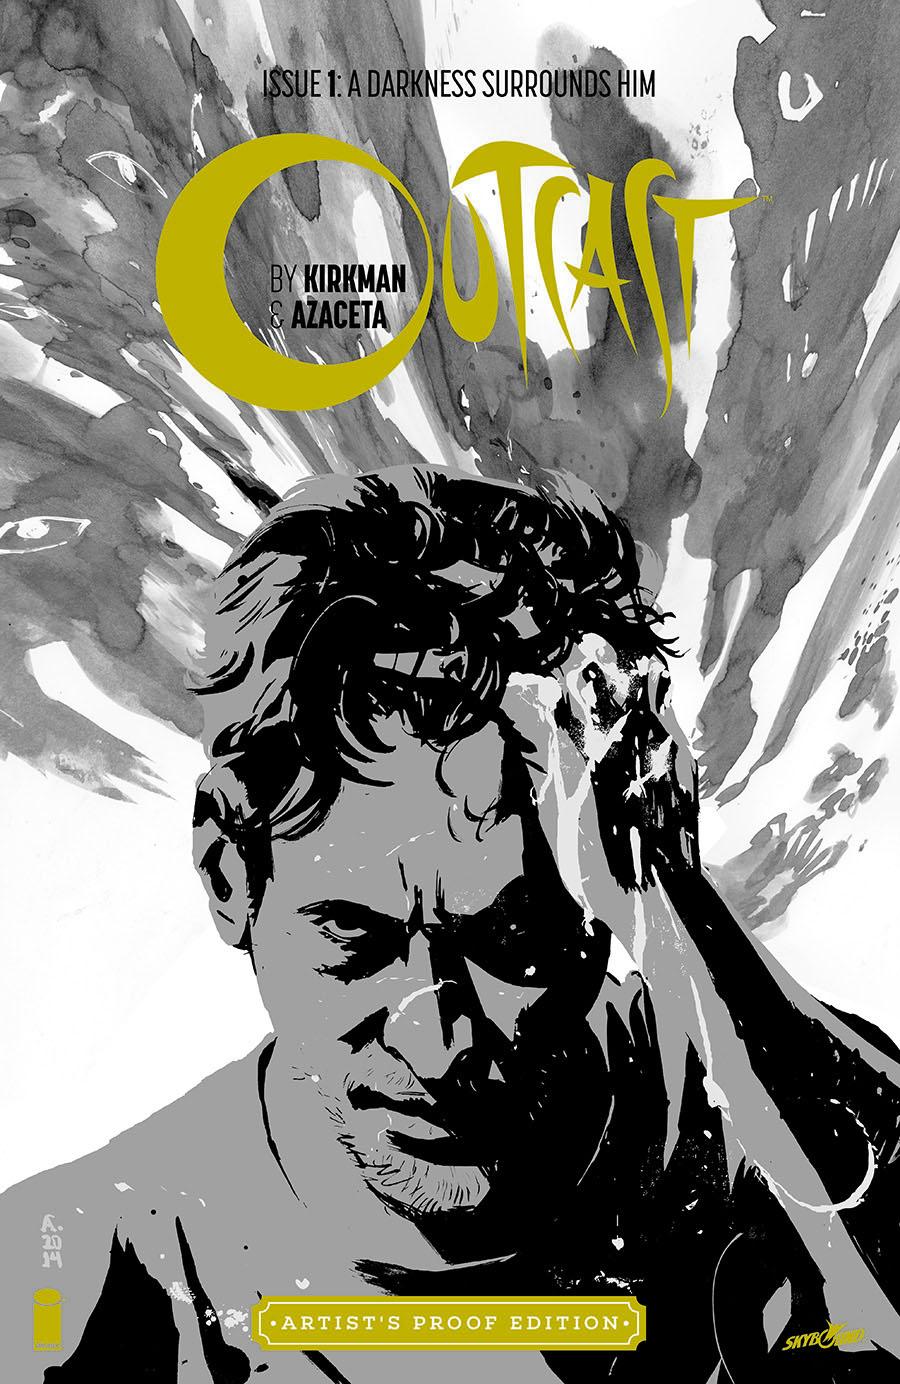 Image Giant-Sized Artists Proof Edition Outcast By Kirkman & Azaceta #1